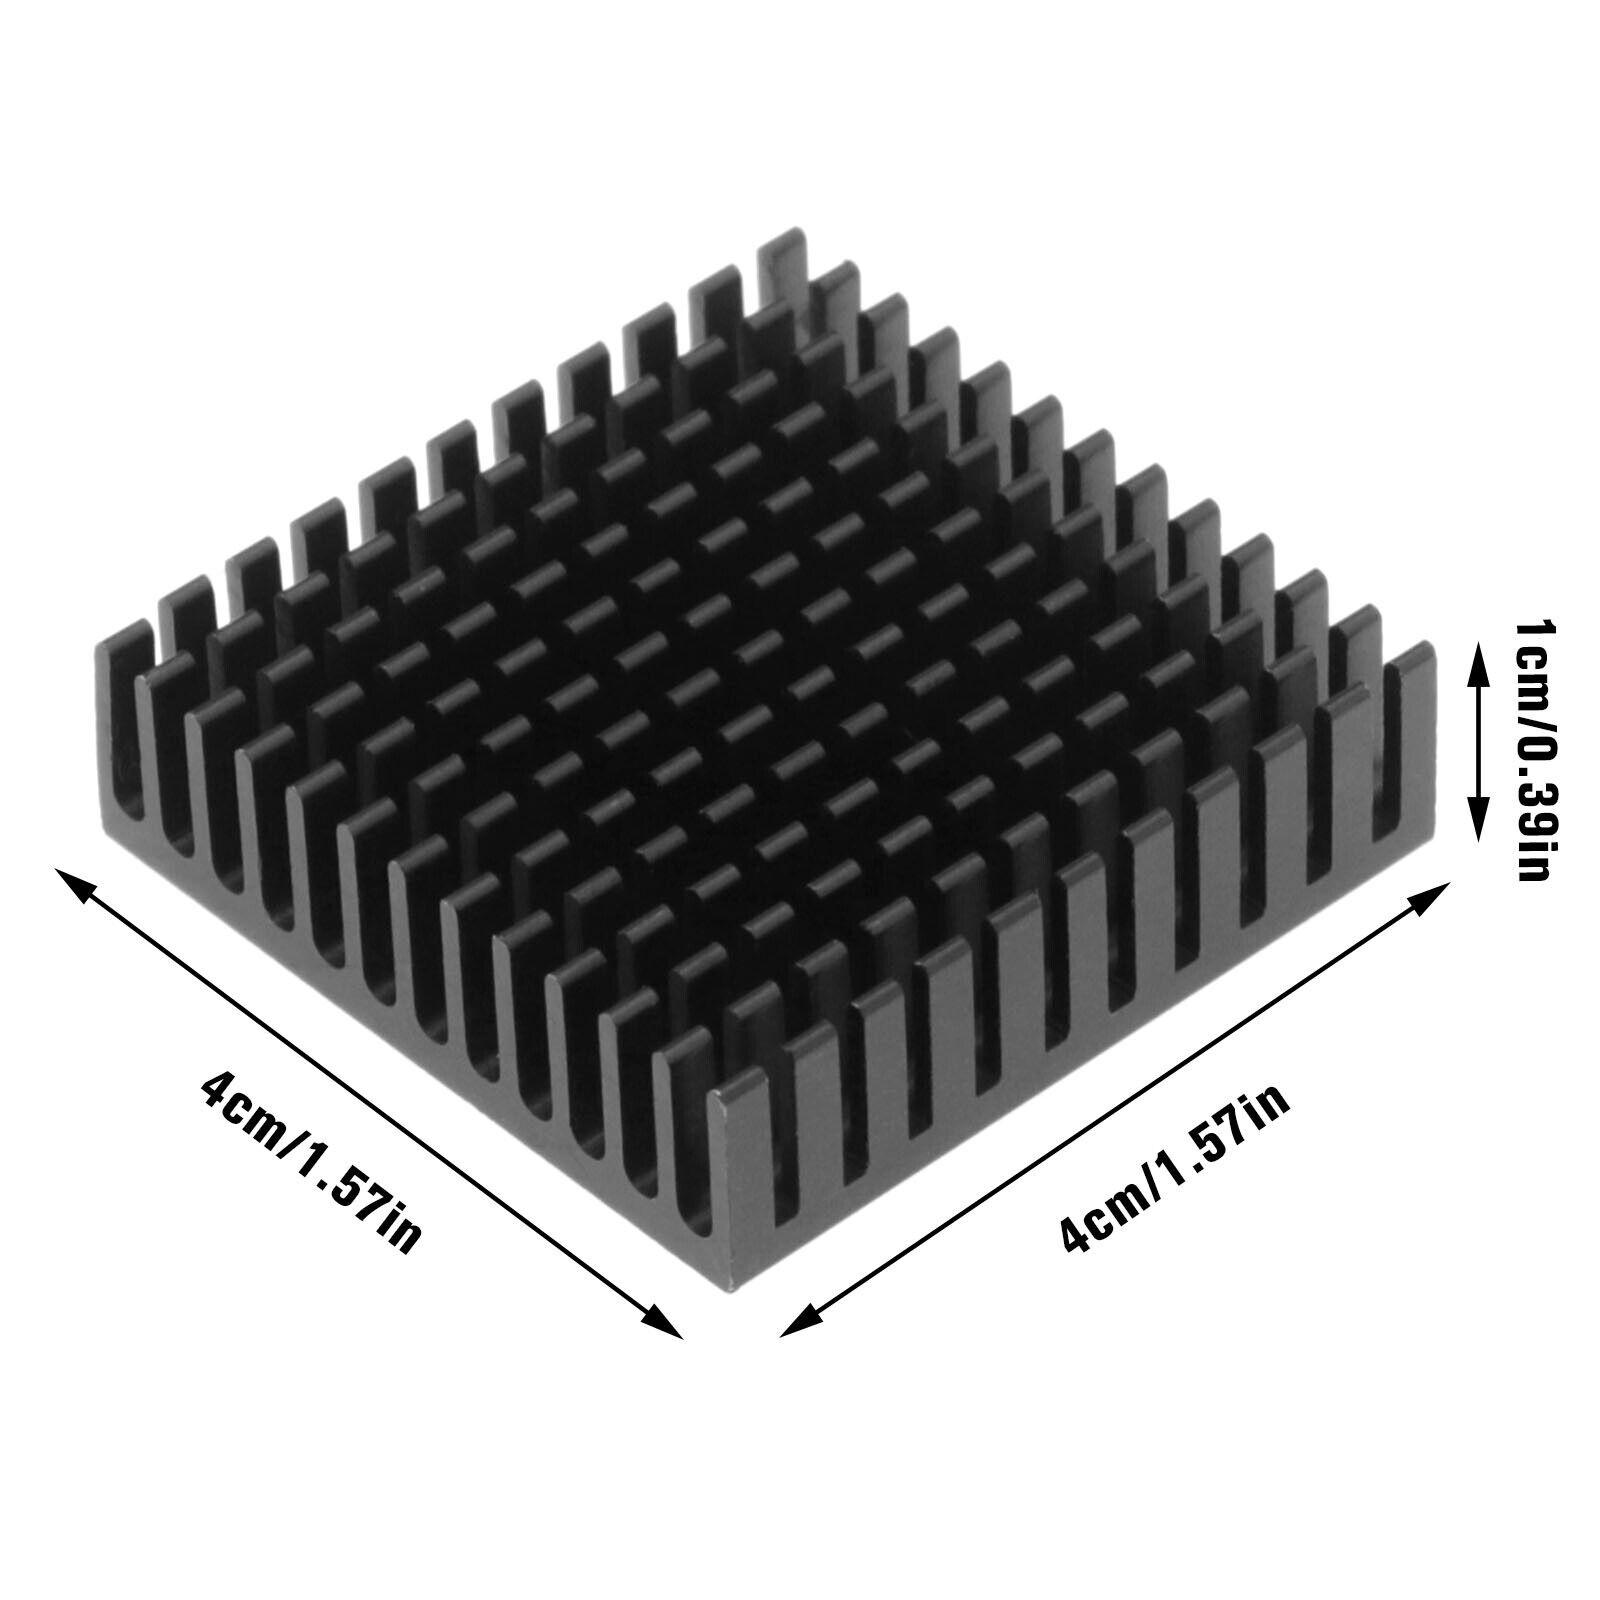 3Pcs Stepper Motor Heatsink for 3D Printer GPU IC Chip MOS 40x40x10mm